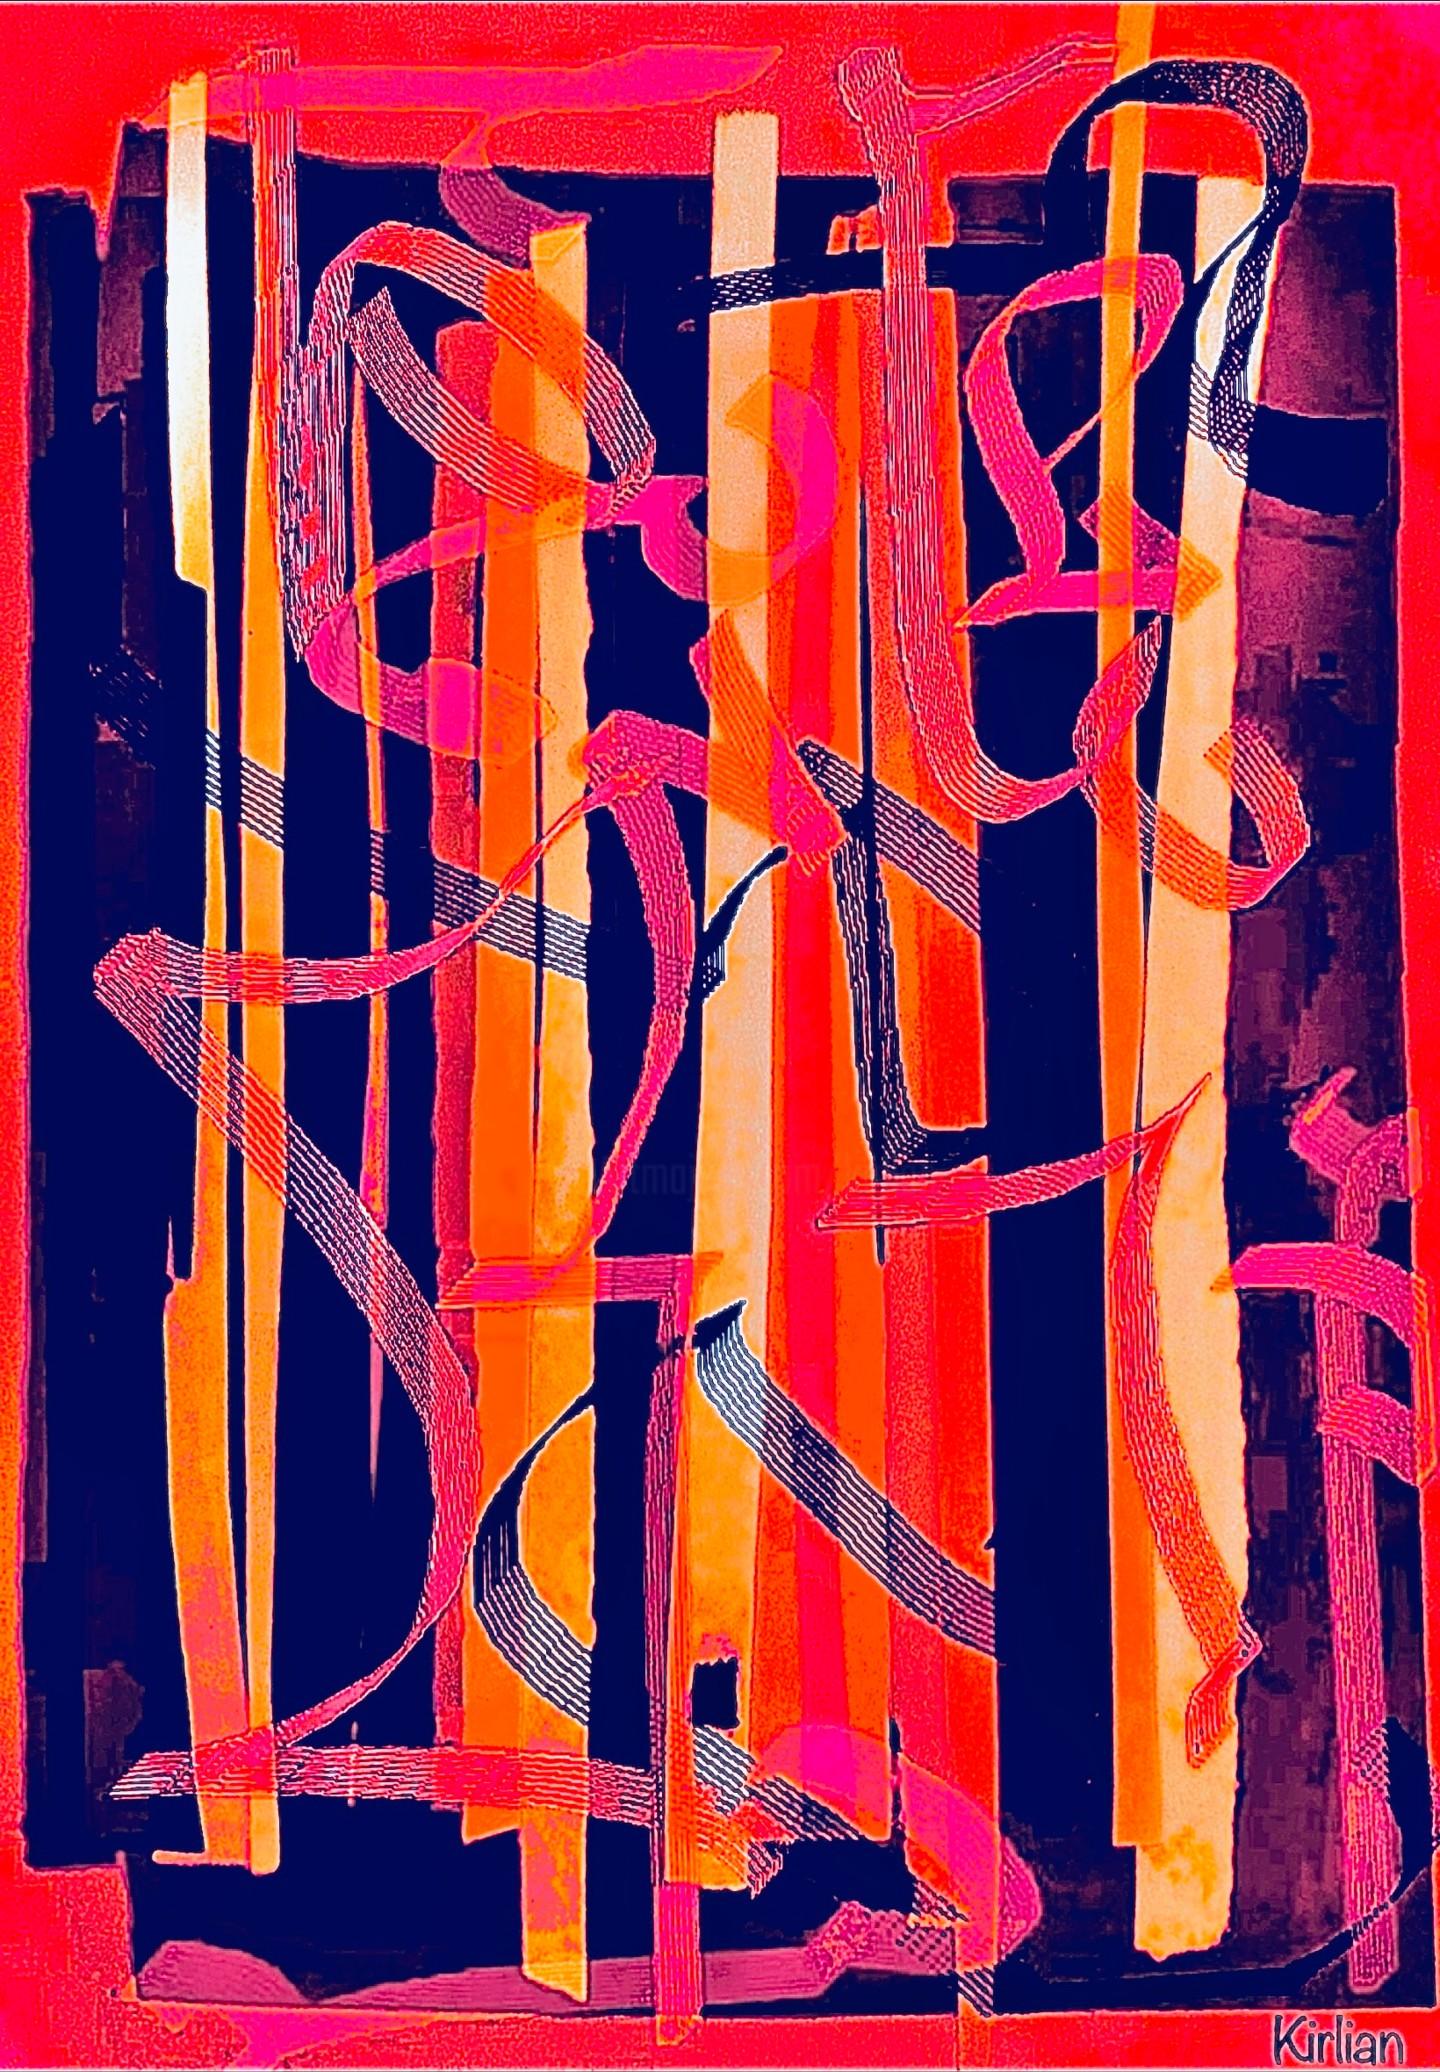 Kirlian - Danzas Tableau moderne contemporain